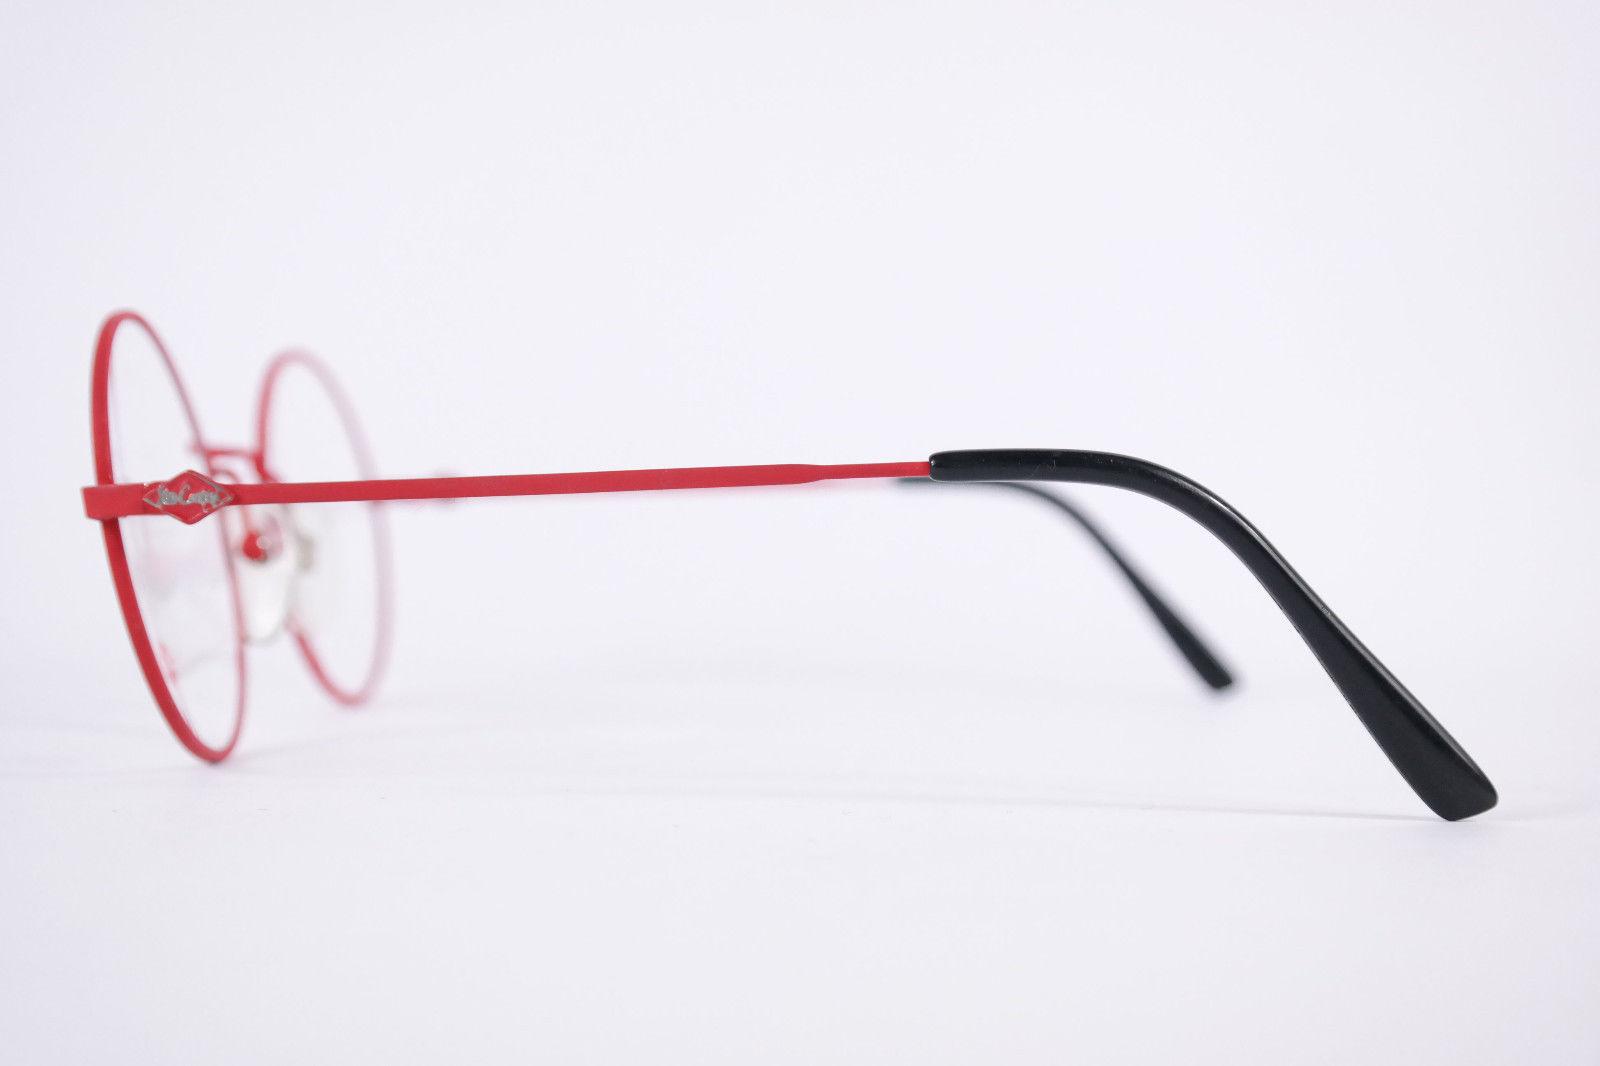 Authentic Lee Cooper Dallas Red Black Round Eyeglasses France Eyewear Unisex image 2